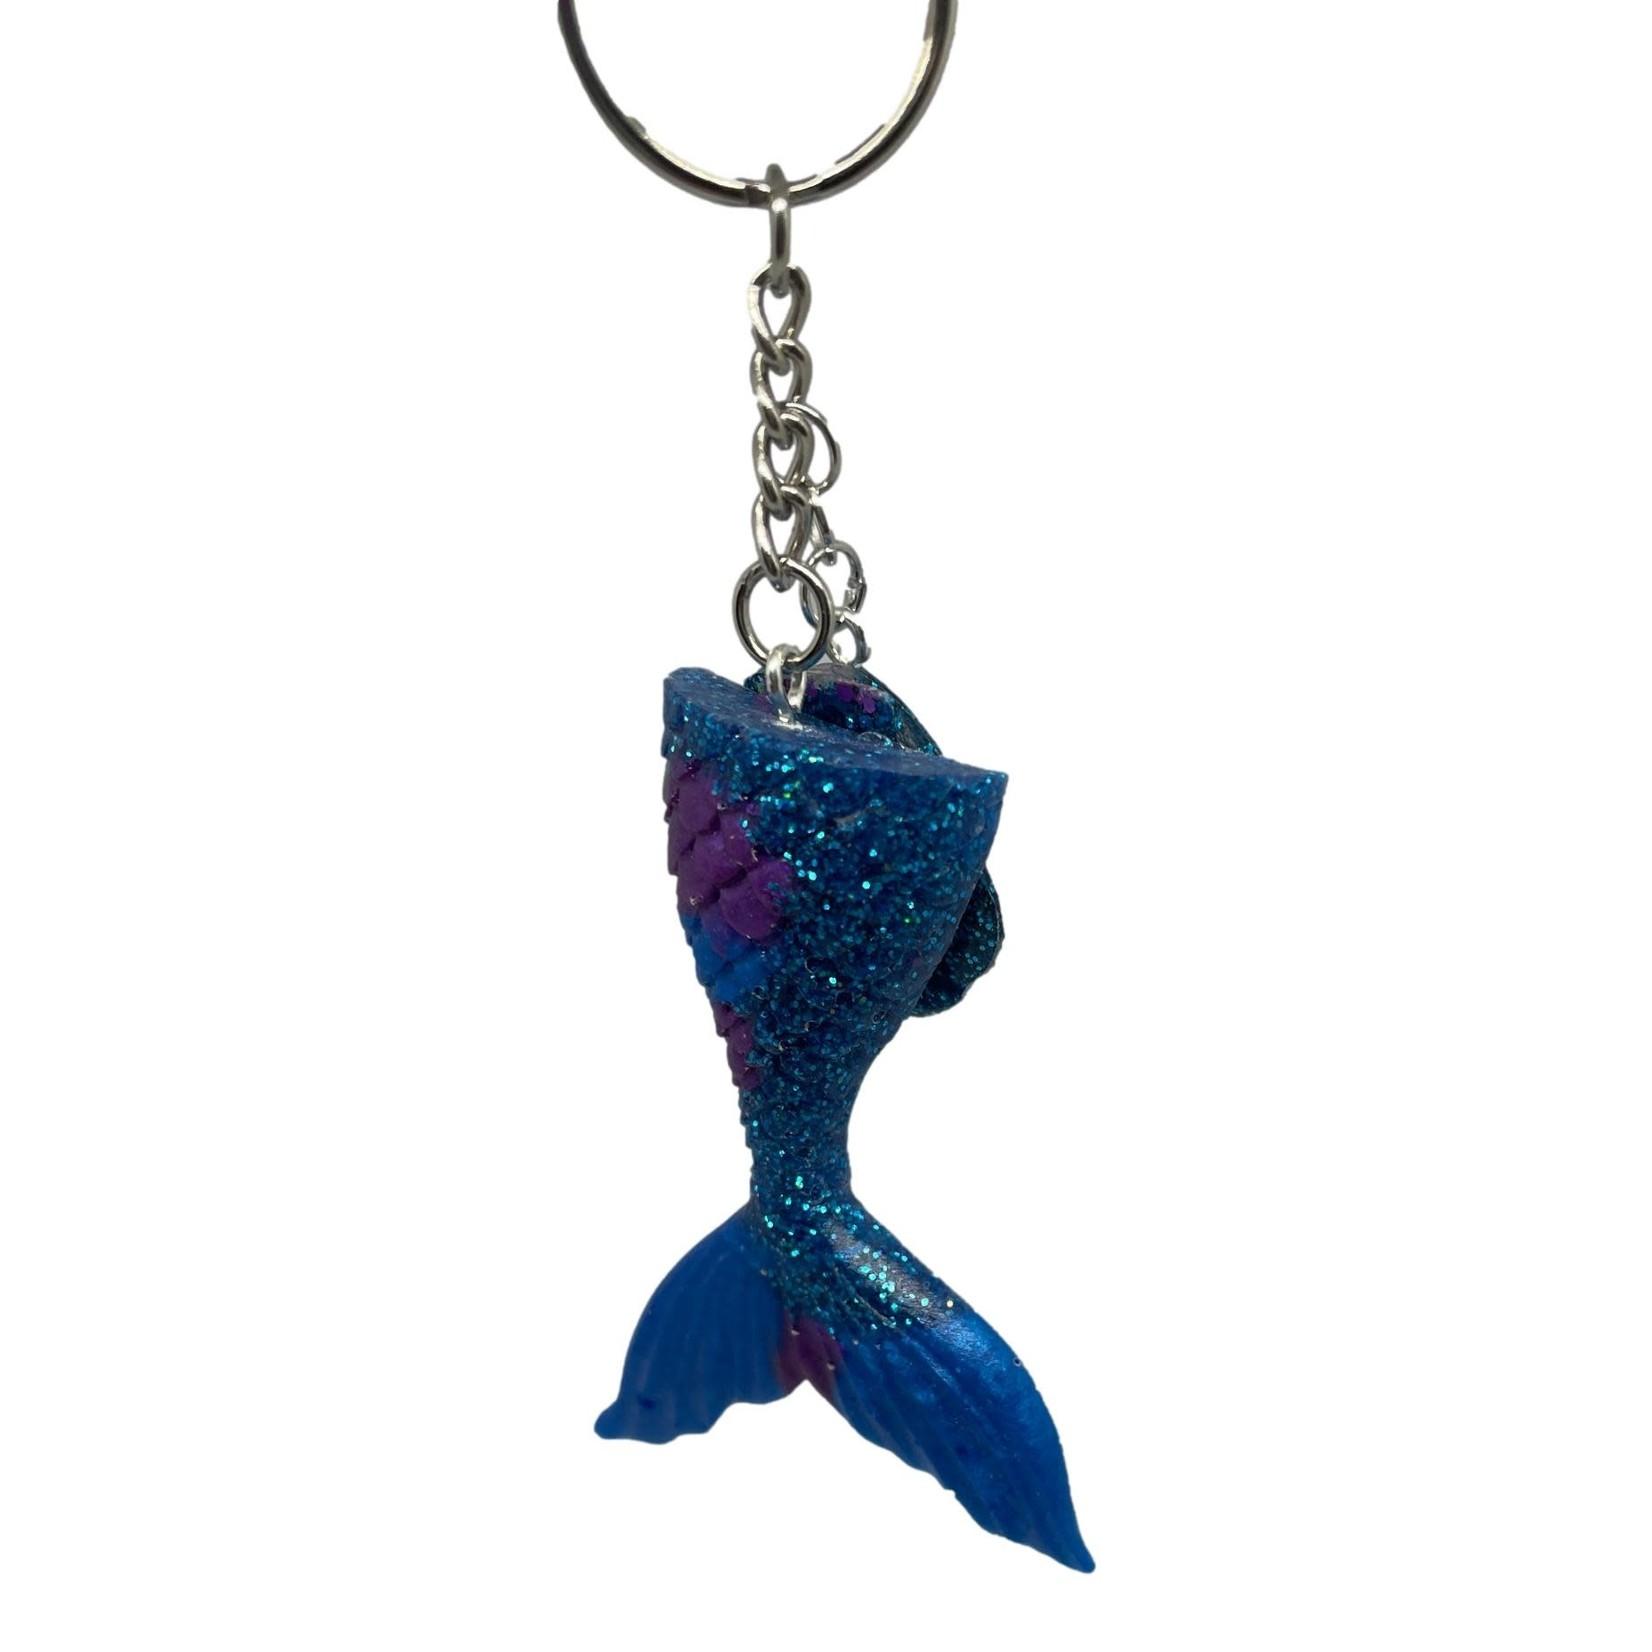 East Coast Sirens Rich Blue Mermaid Tail Key Chain